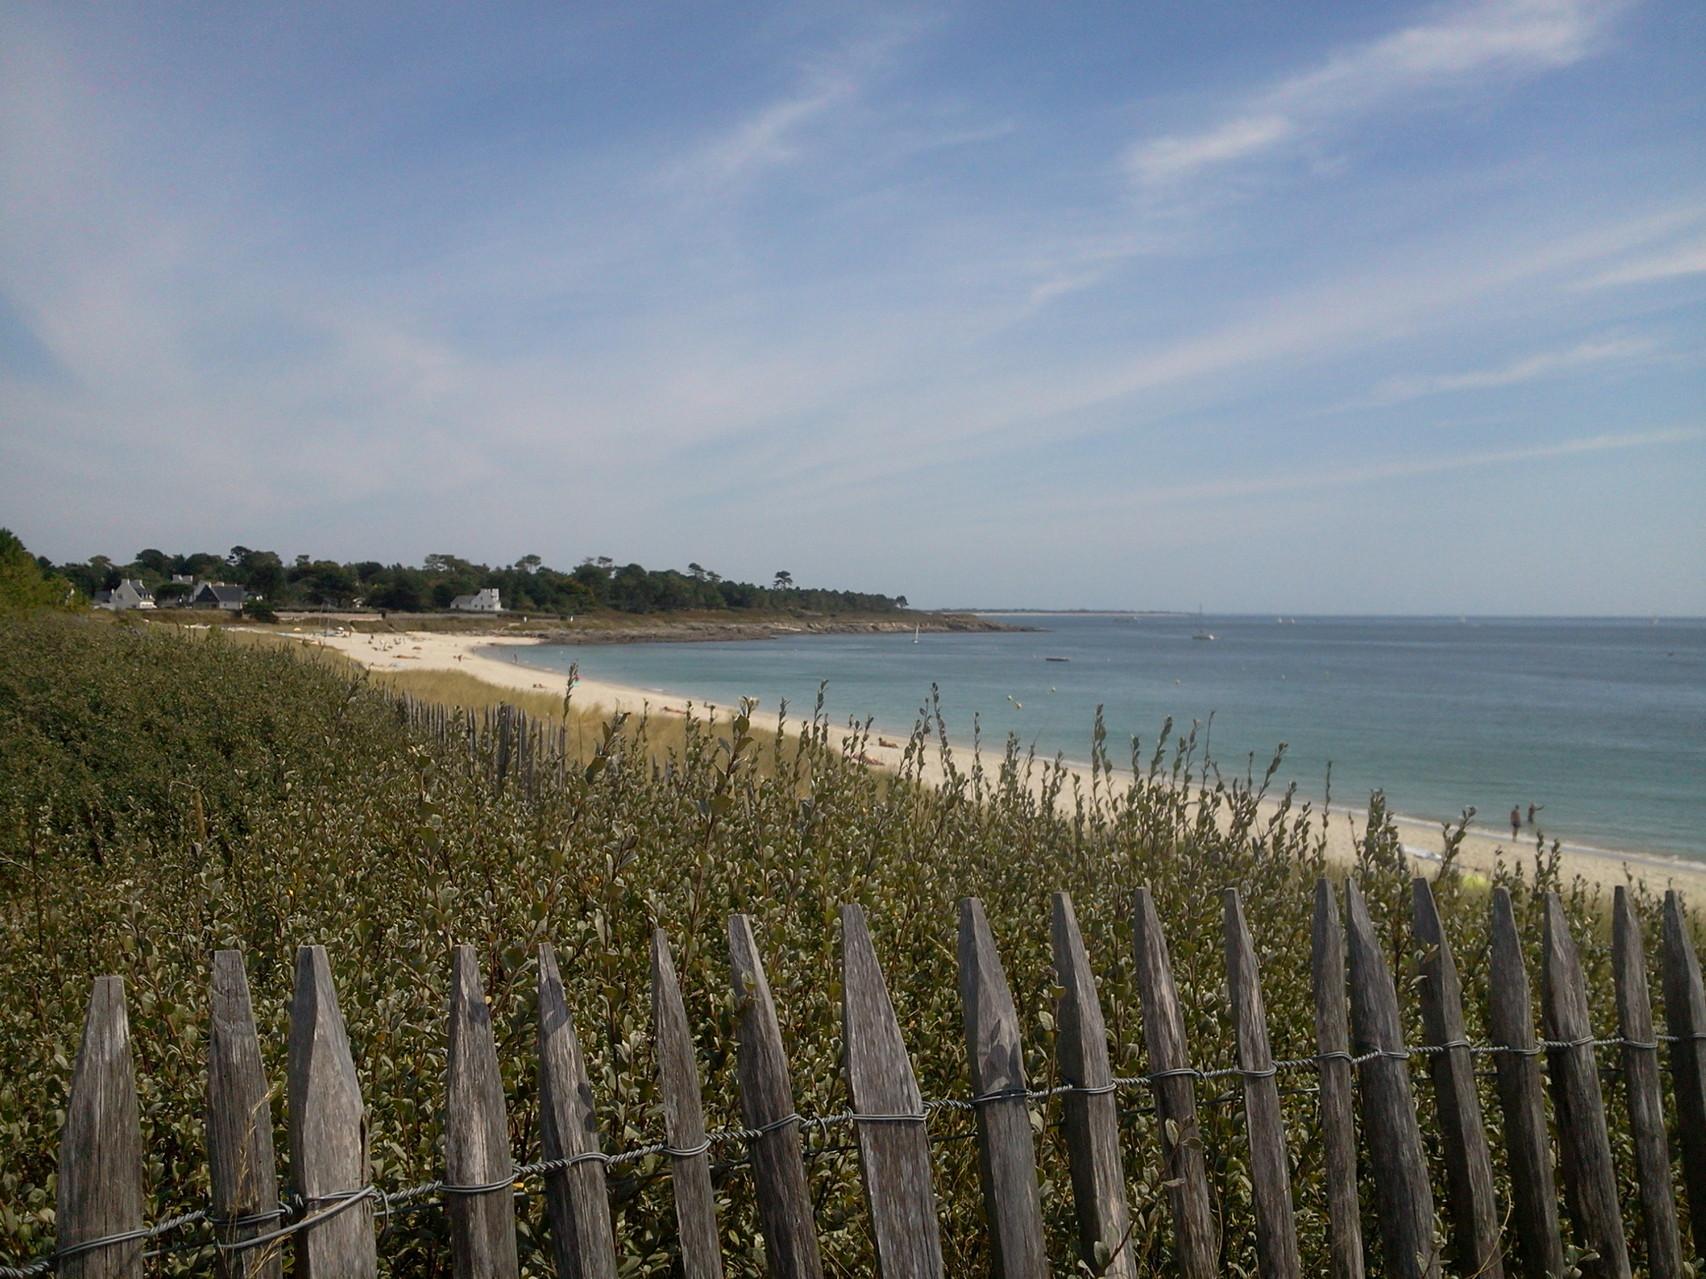 La grande plage et lapointe de Ste Marine